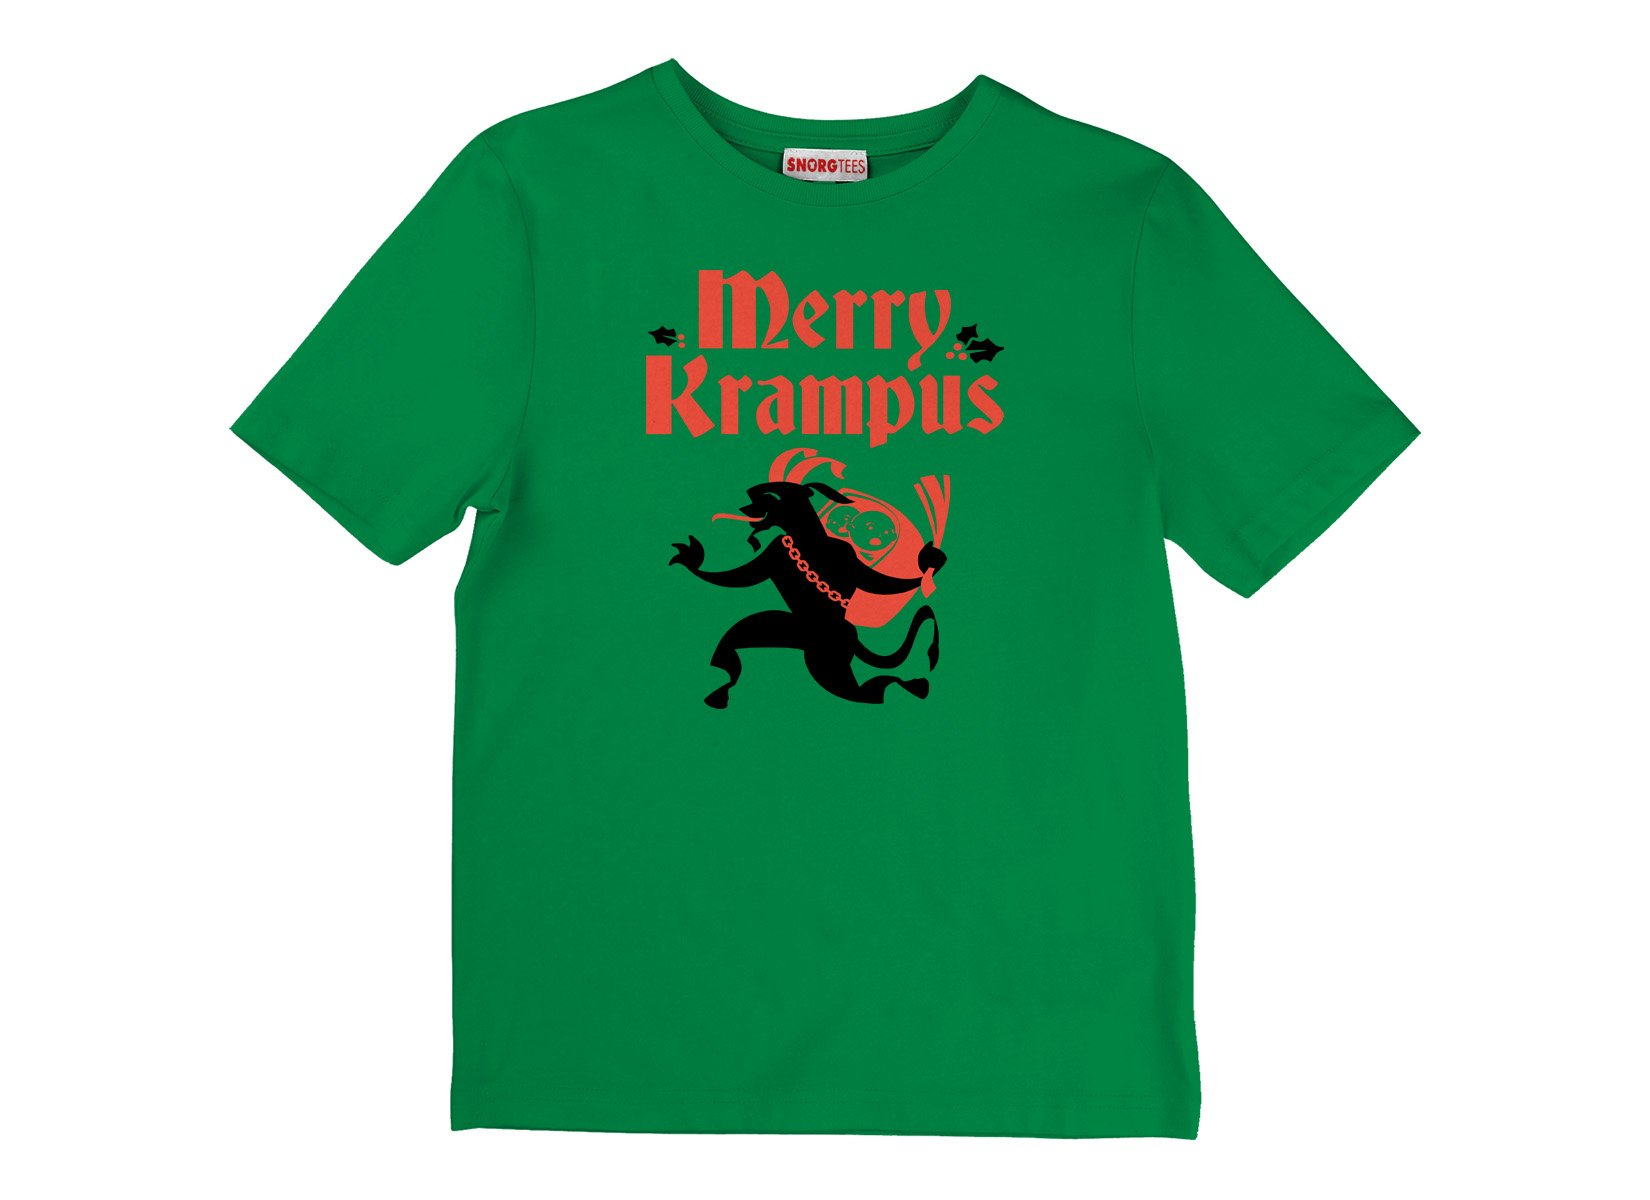 Merry Krampus on Kids T-Shirt